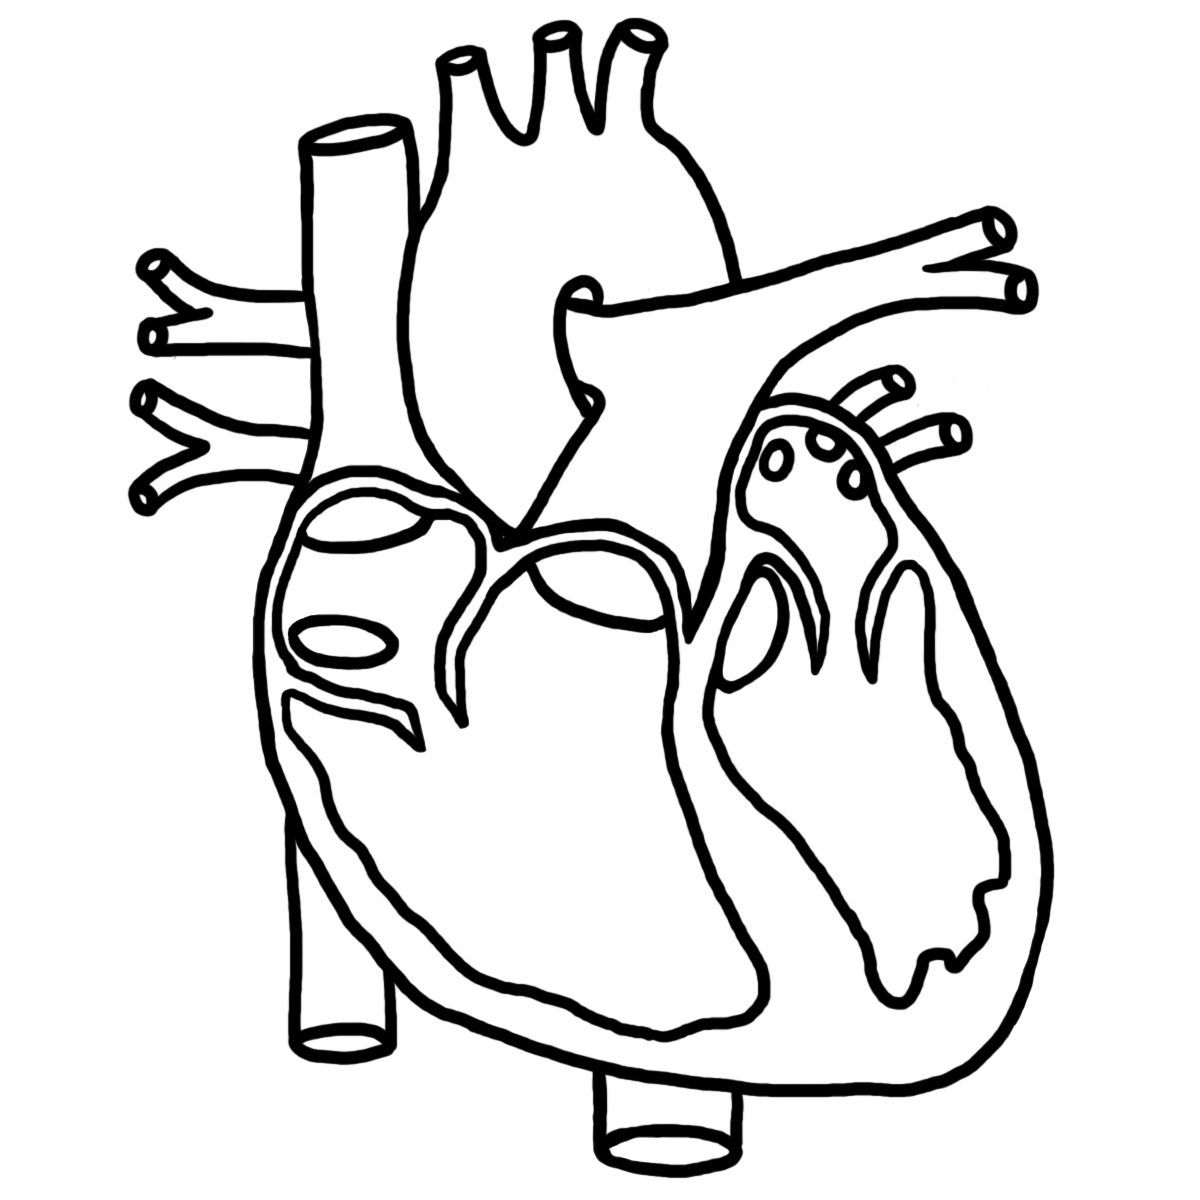 Human Heart Diagram Without Labels - koibana.info | Tela ...